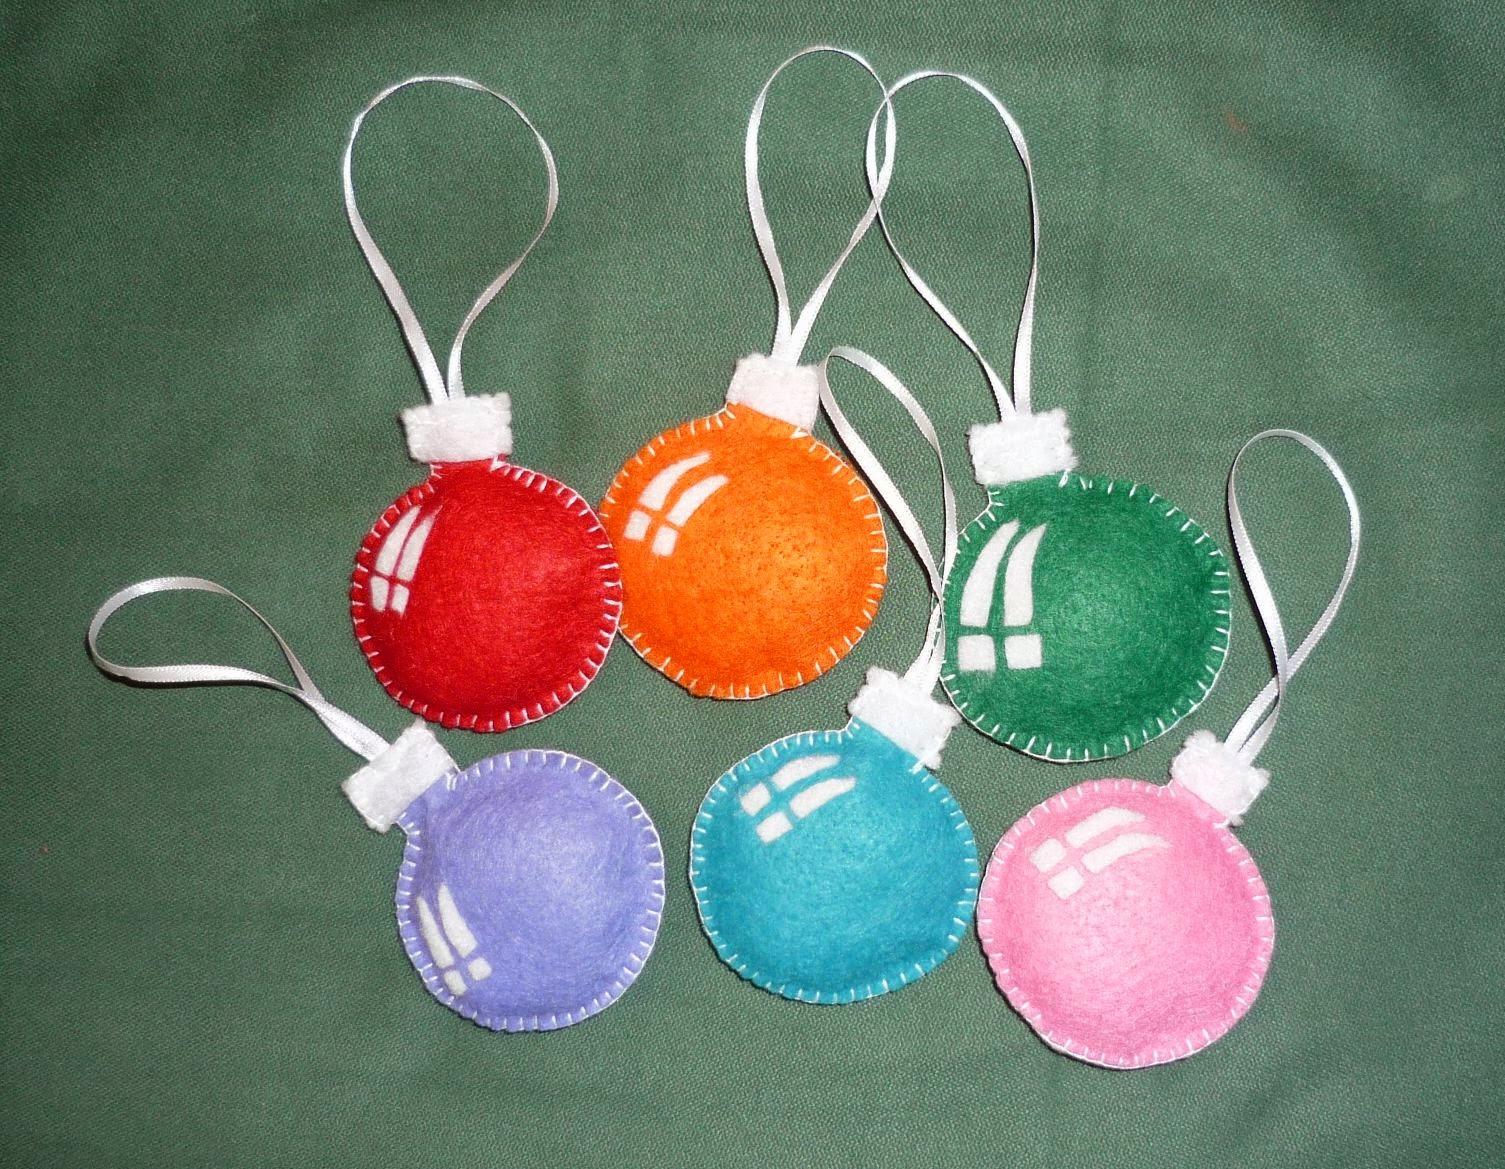 Educaci n preescolar adornos navide os de fieltro - Bolas de navidad de fieltro ...